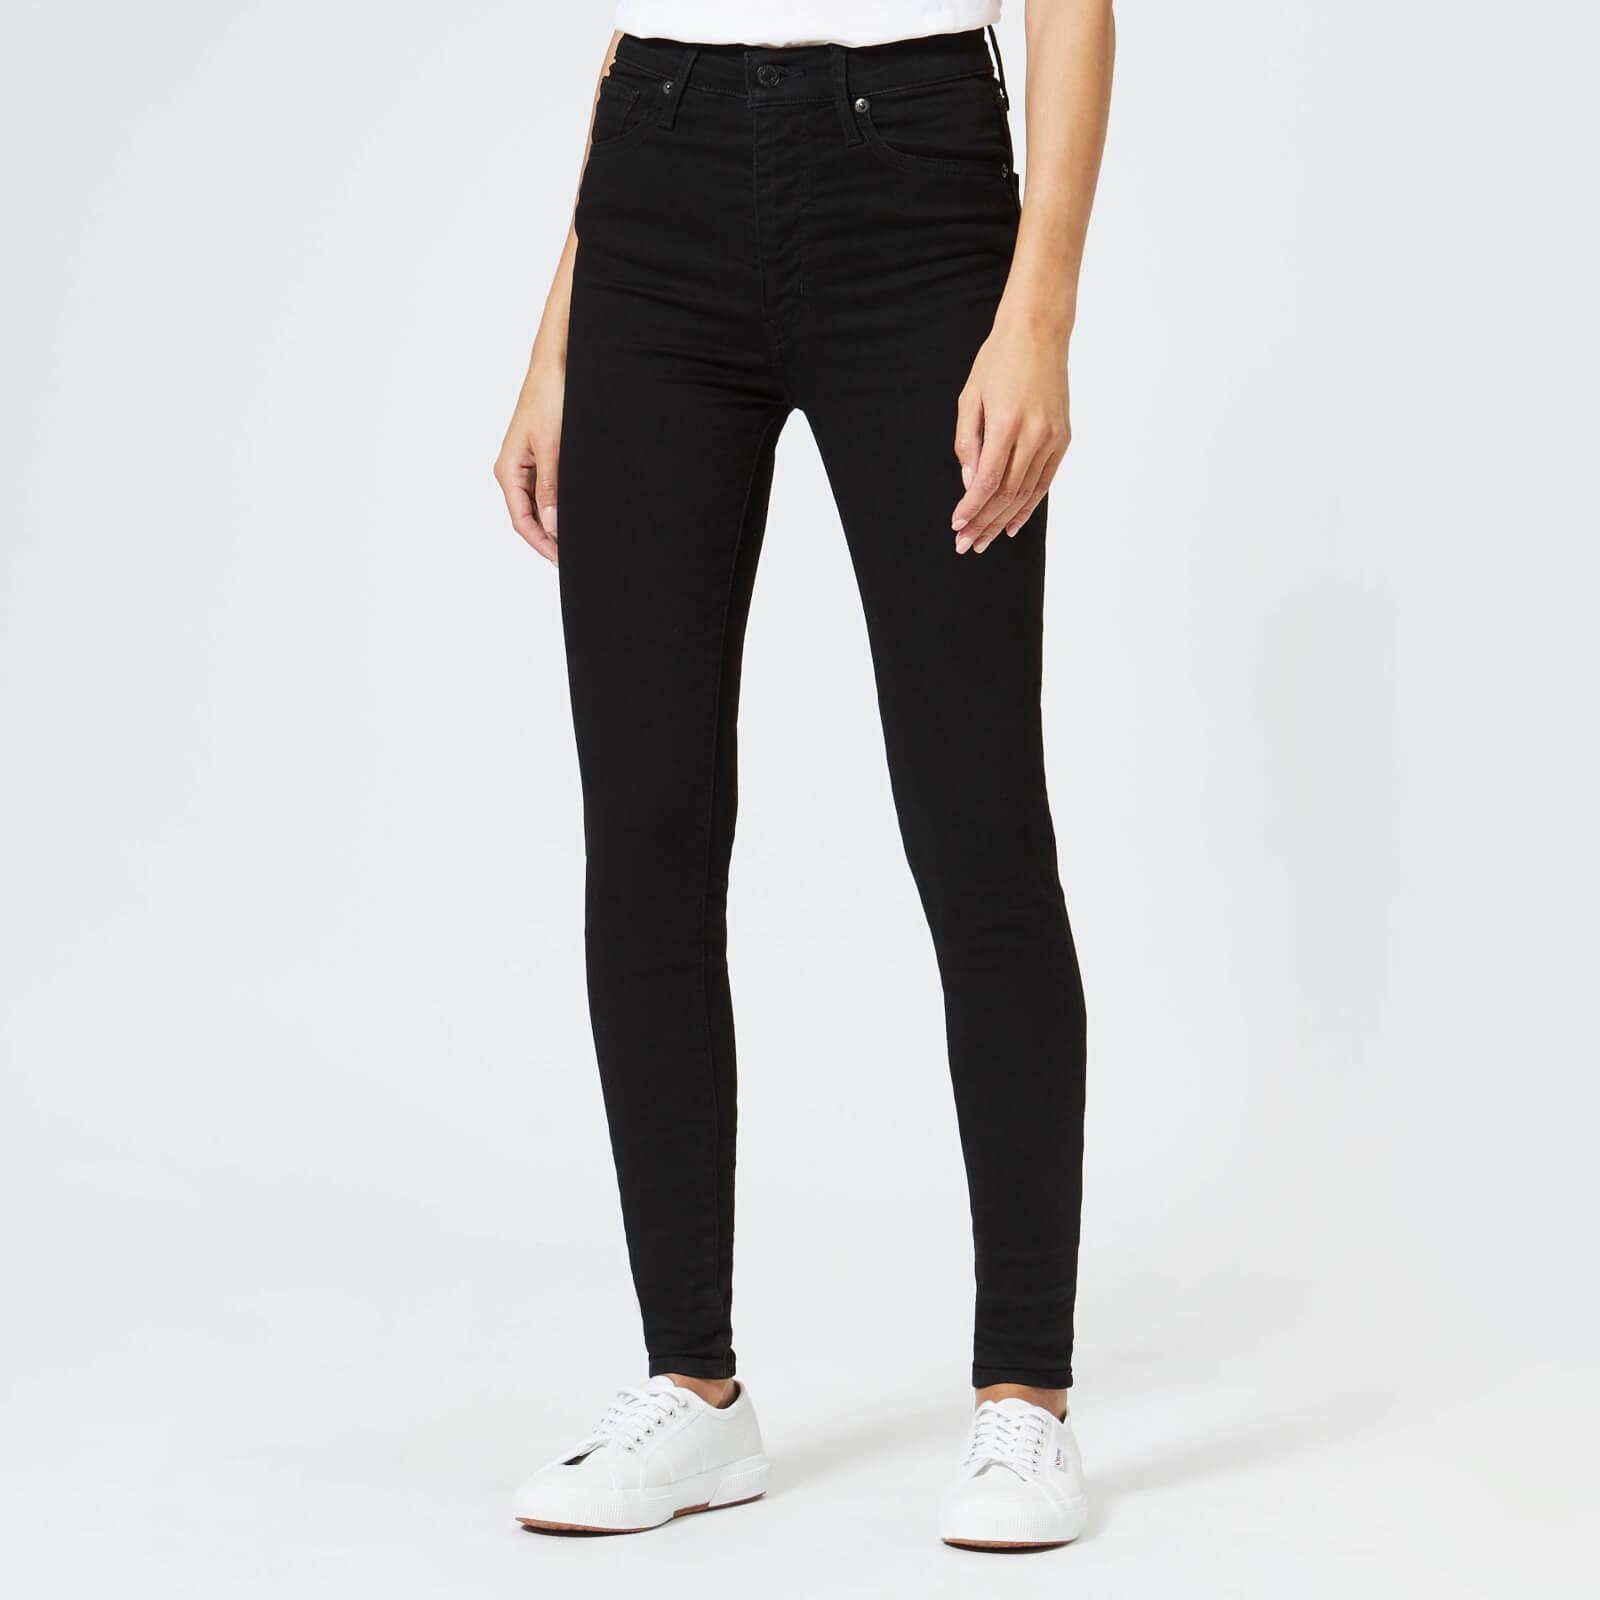 Levi's s Mile High Super Skinny Jeans - Black Galaxy - W25/L30